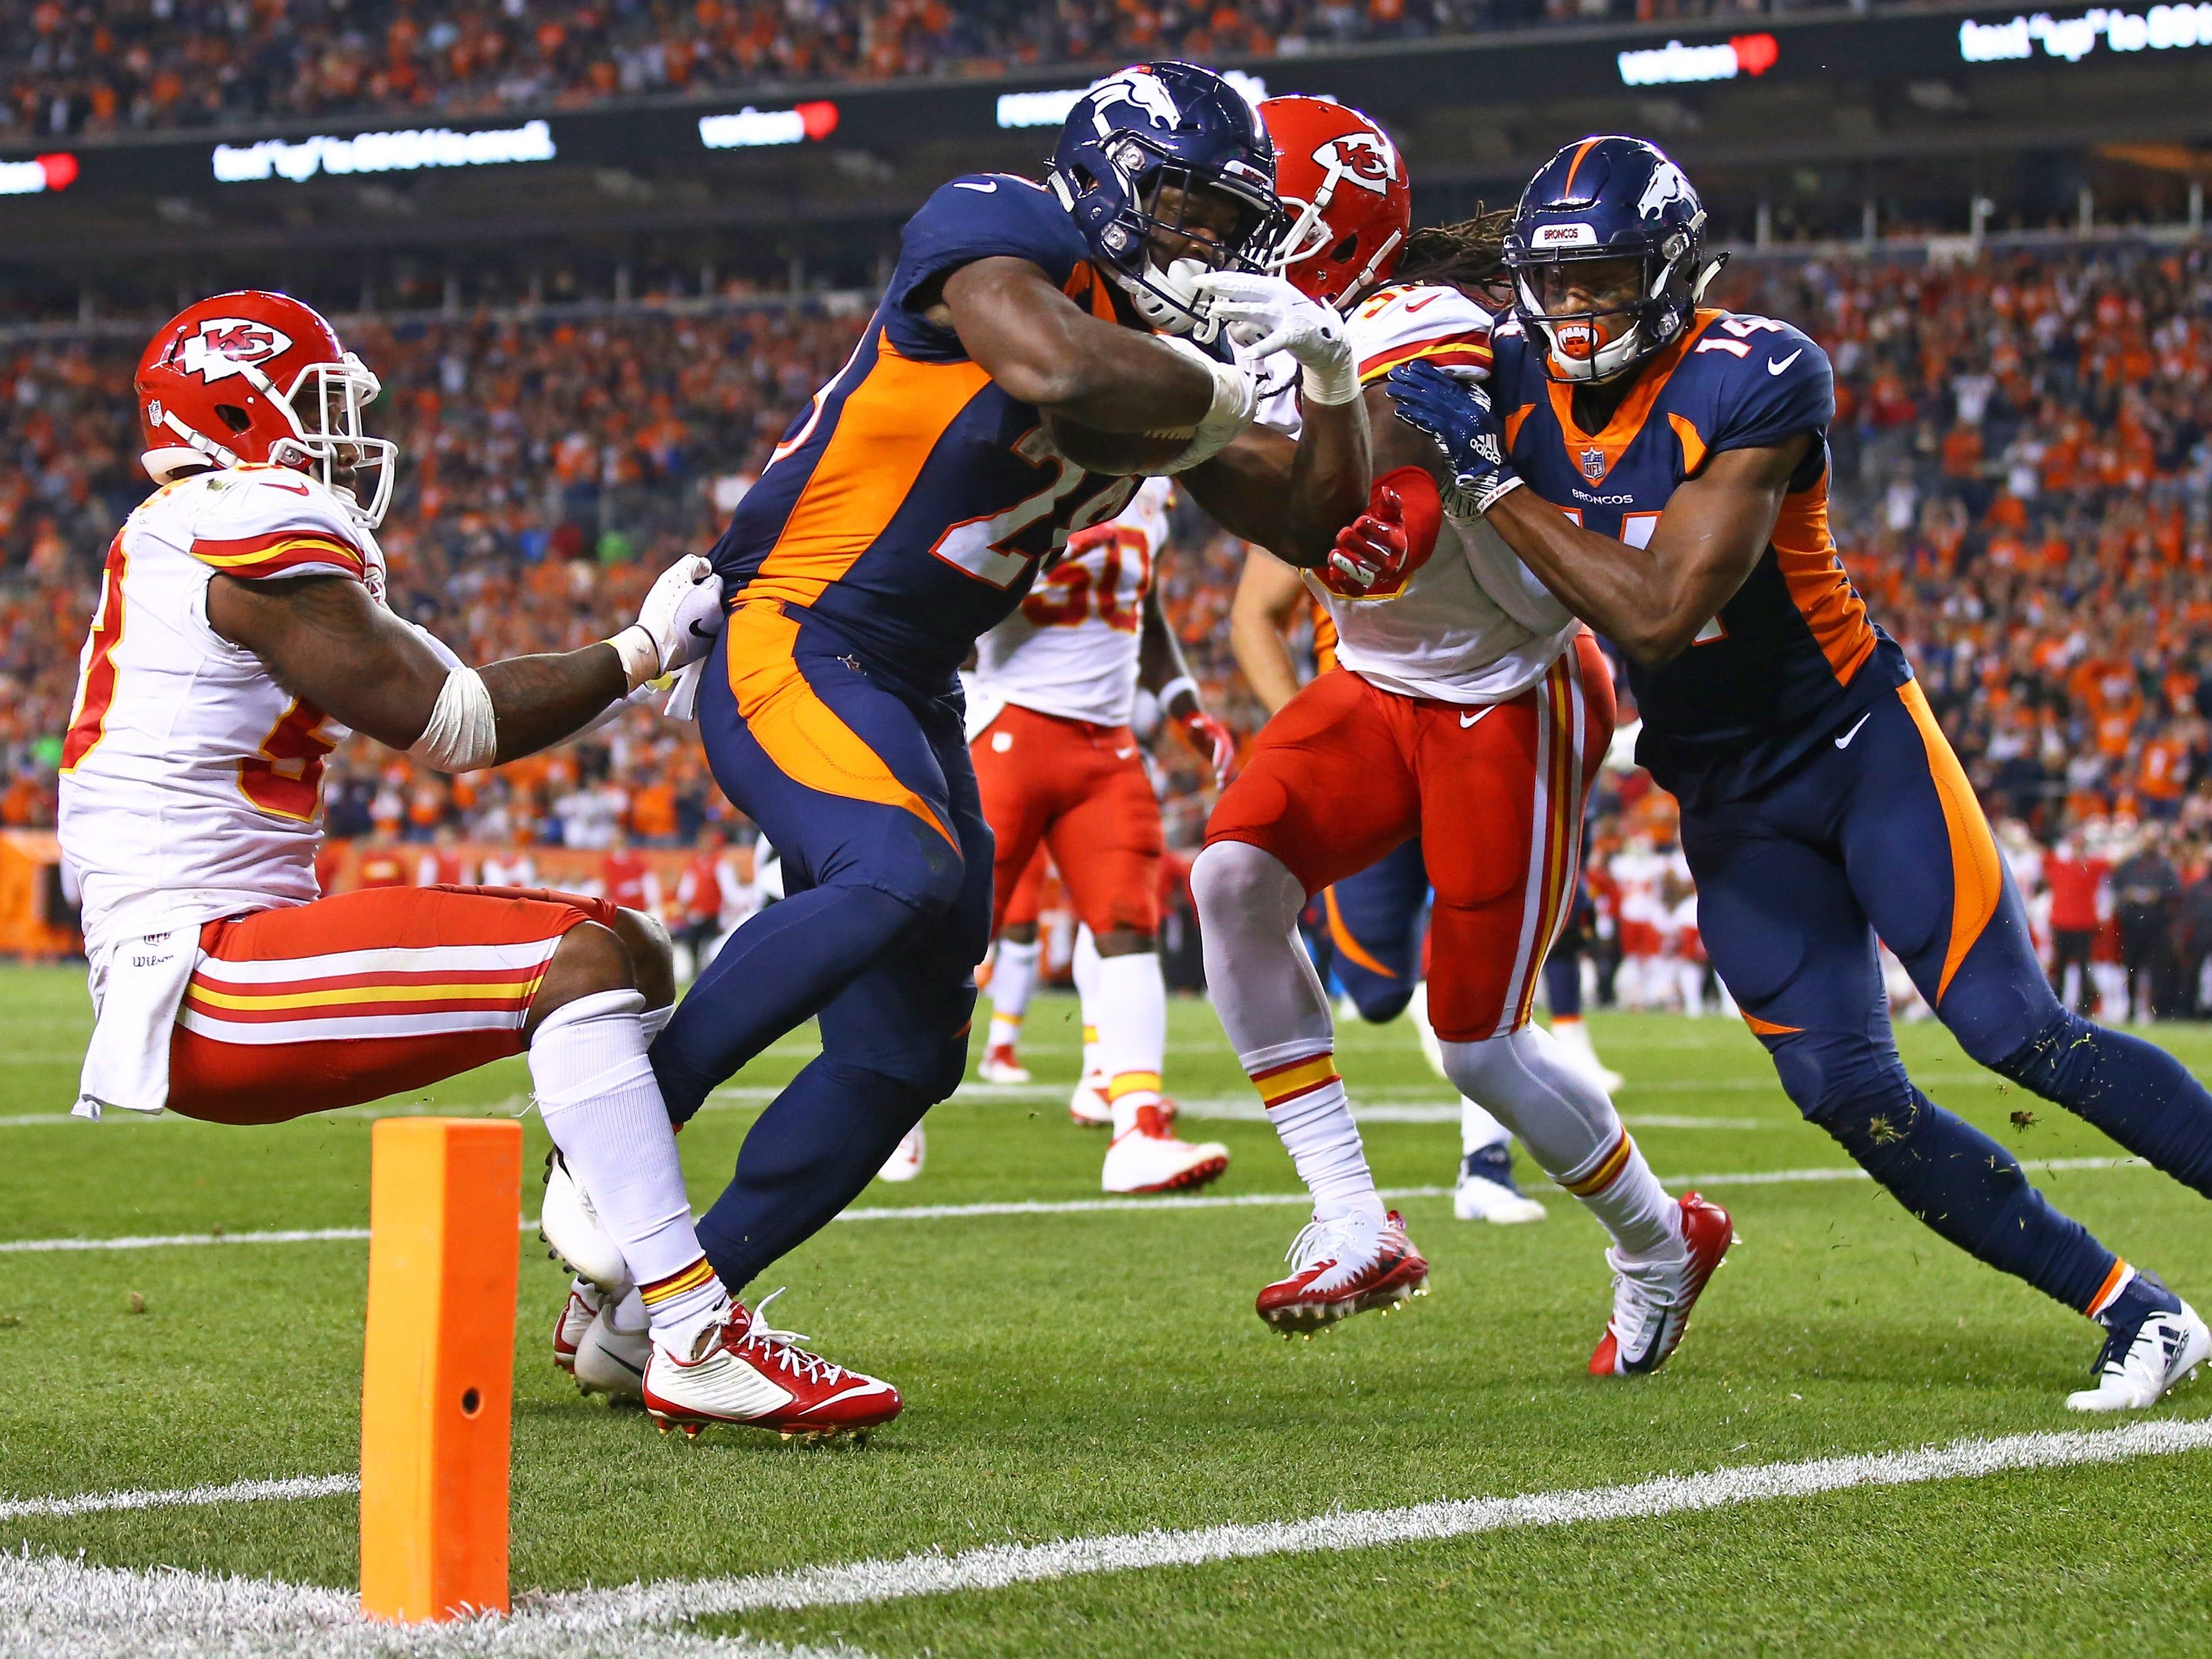 Denver Broncos running back Royce Freeman  scores a second quarter touchdown against the Kansas City Chiefs.